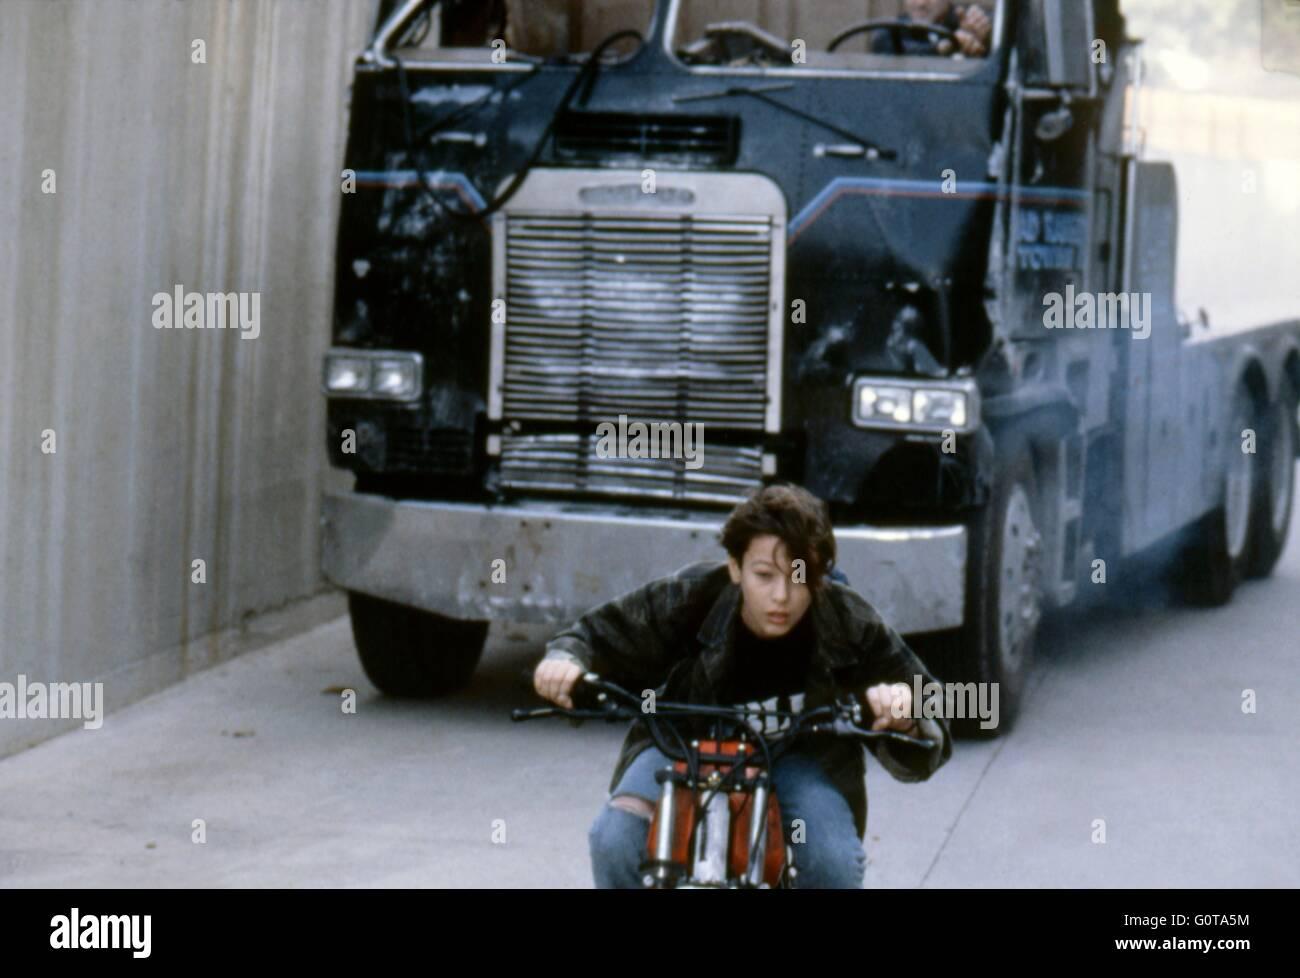 Edward Furlong / Terminator 2 : Judgment Day / 1991 directed by James Cameron (Carolco Pïctures) - Stock Image